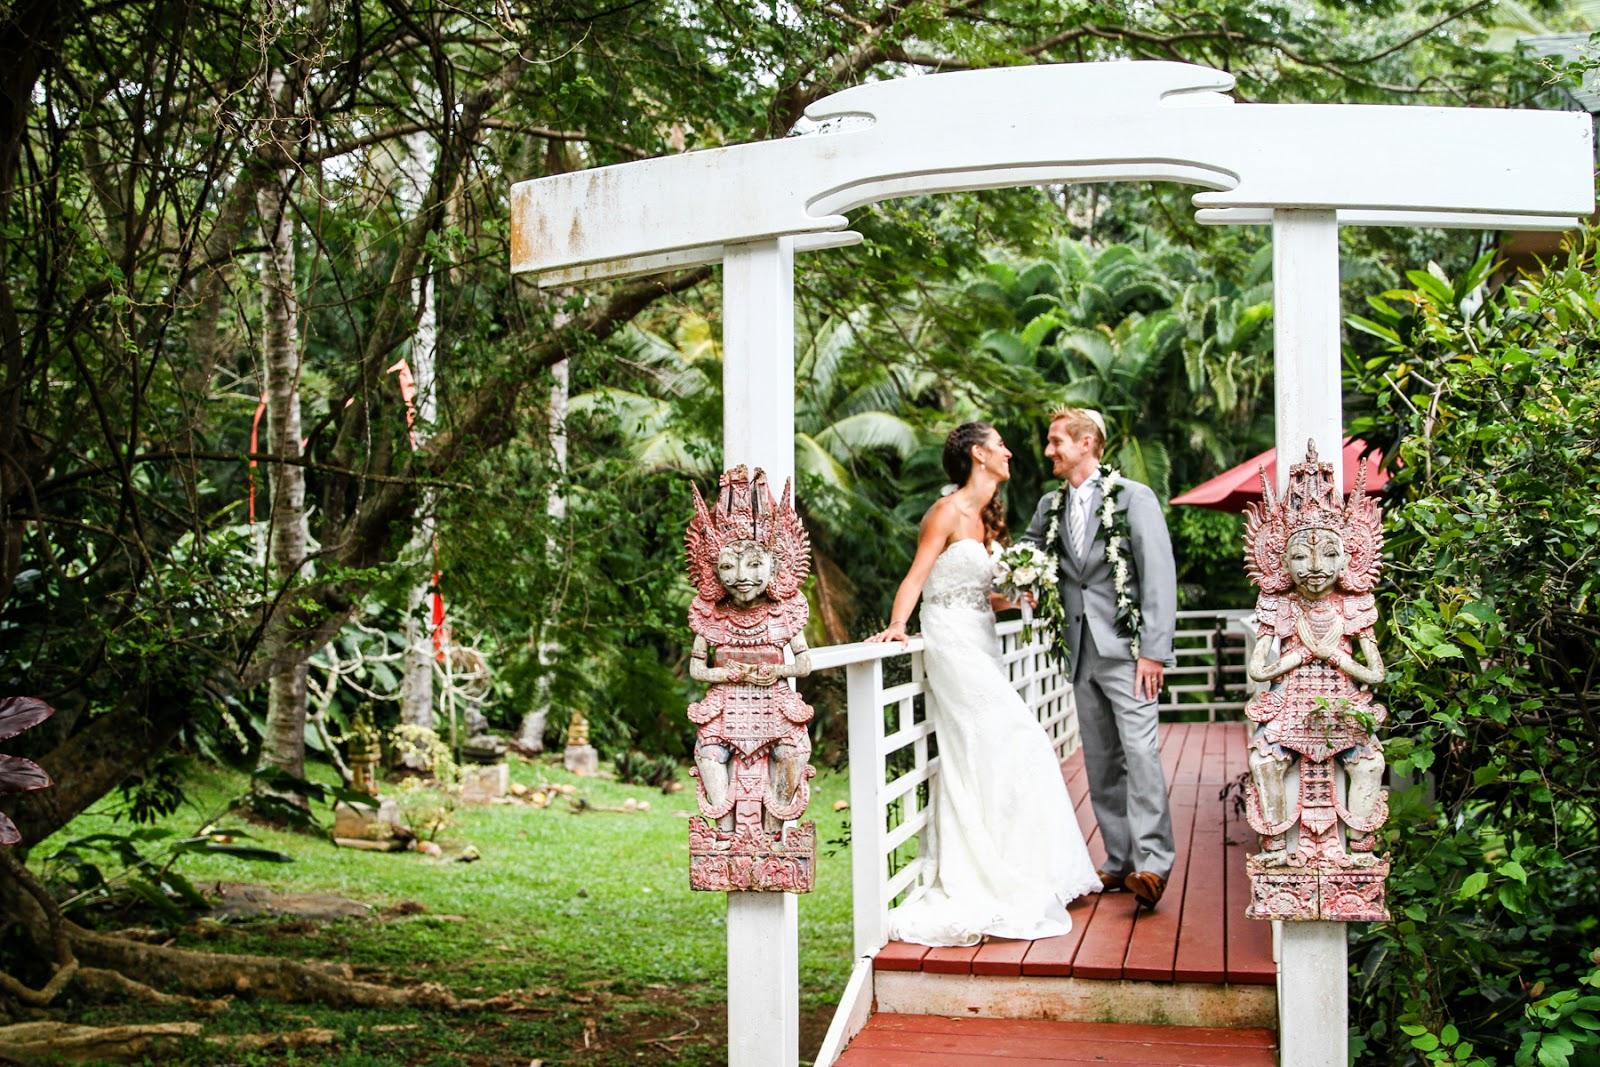 Melissa kite wedding